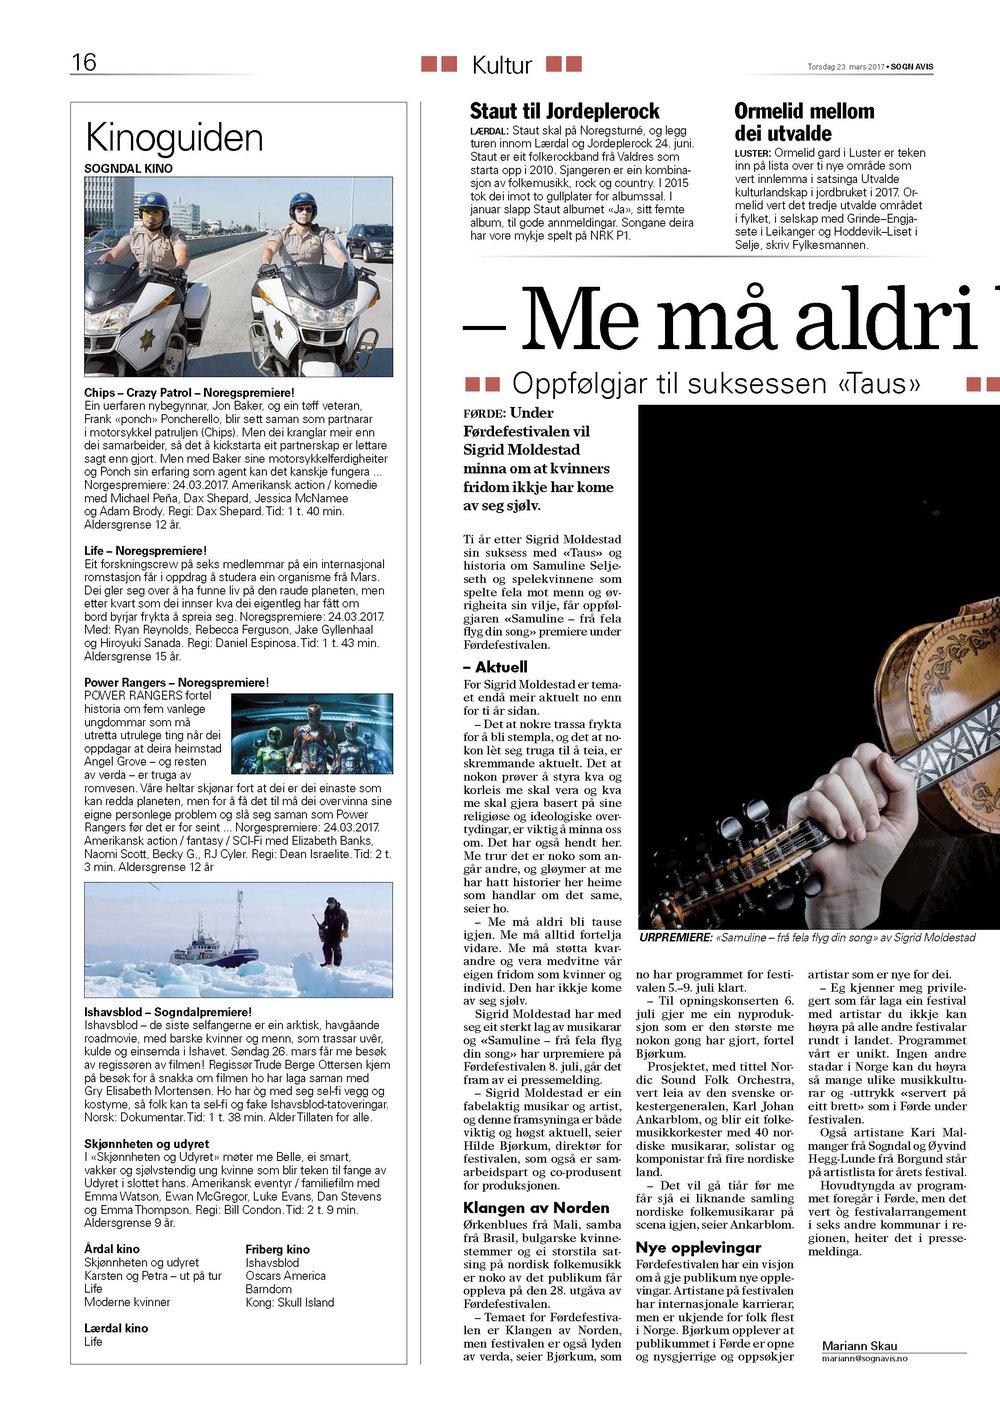 Sogn-Avis-2017-03-23-side-16 - Programslepp - Sigrid Moldestad.jpg